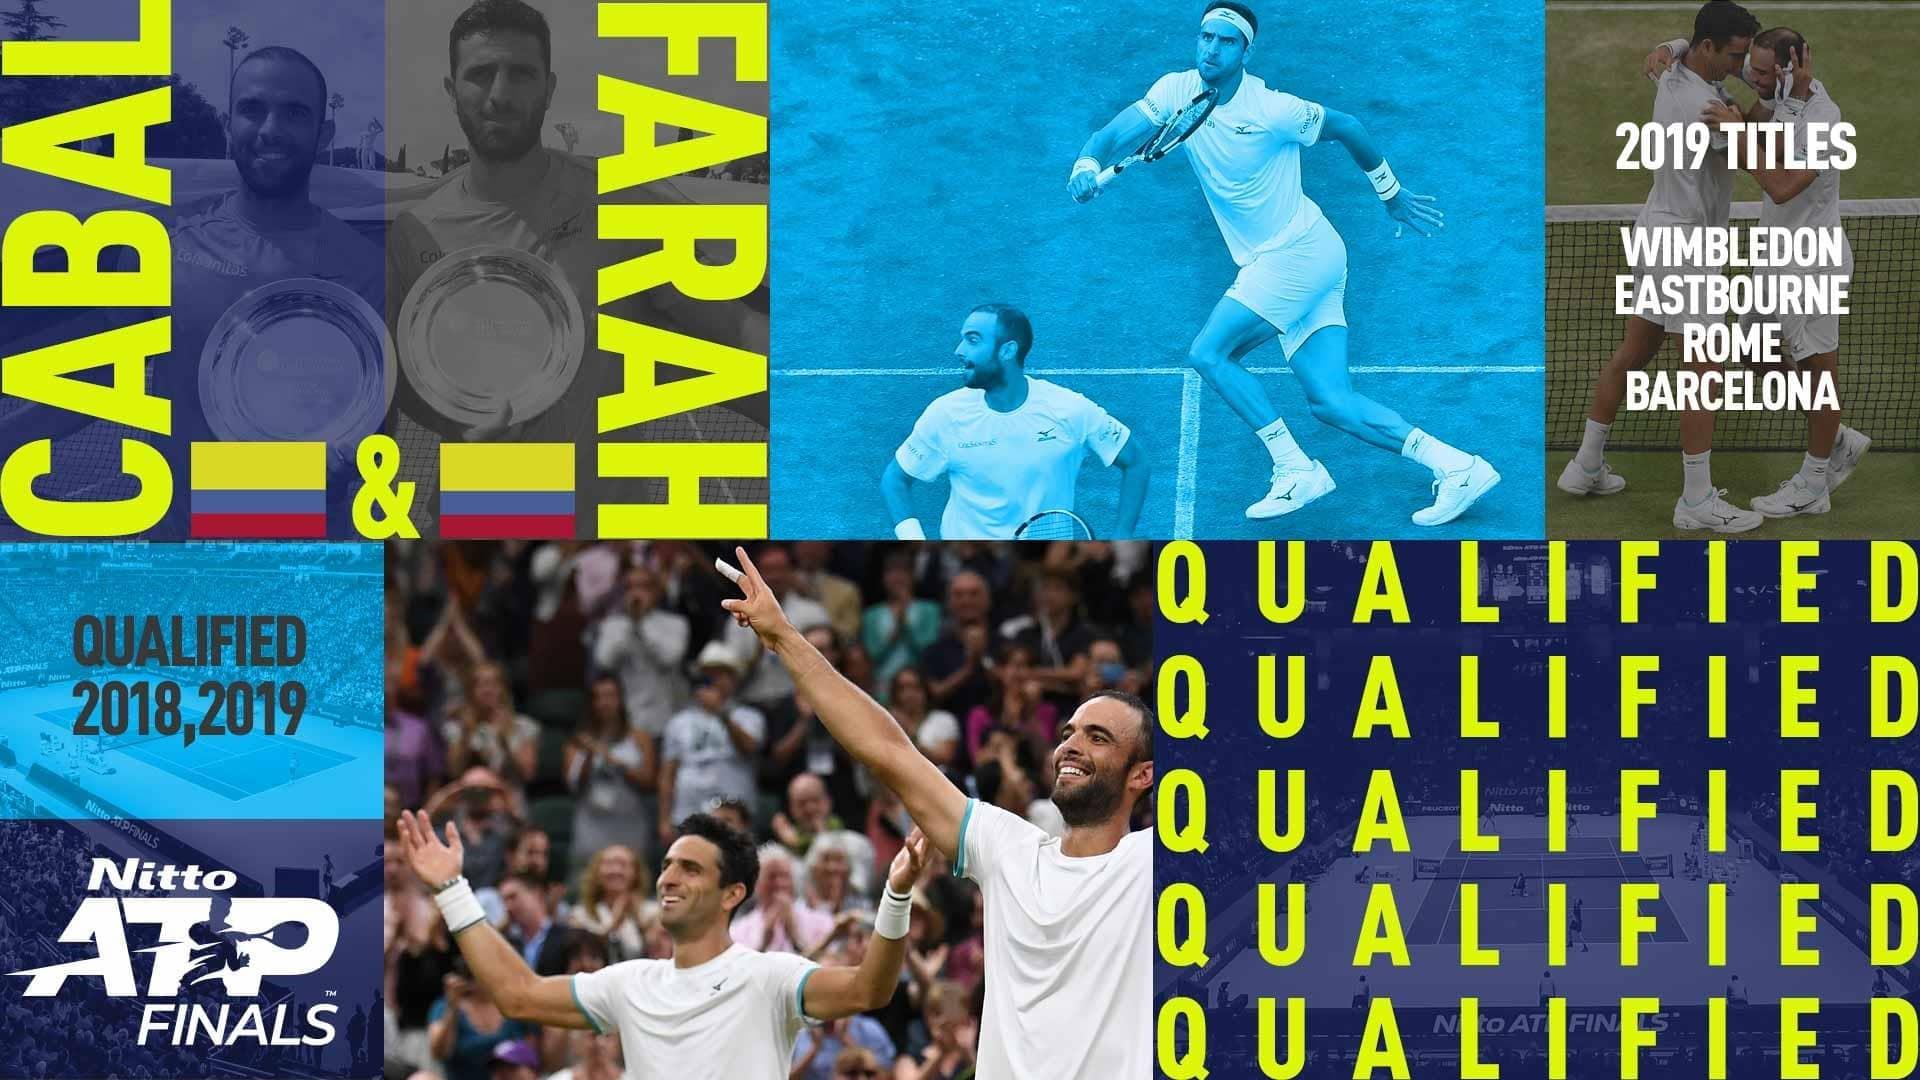 <a href='https://www.atptour.com/en/players/juan-sebastian-cabal/c834/overview'>Juan Sebastian Cabal</a> and <a href='https://www.atptour.com/en/players/robert-farah/f525/overview'>Robert Farah</a> have qualified for the <a href='https://www.atptour.com/en/tournaments/nitto-atp-finals/605/overview'>Nitto ATP Finals</a> for the second consecutive year.